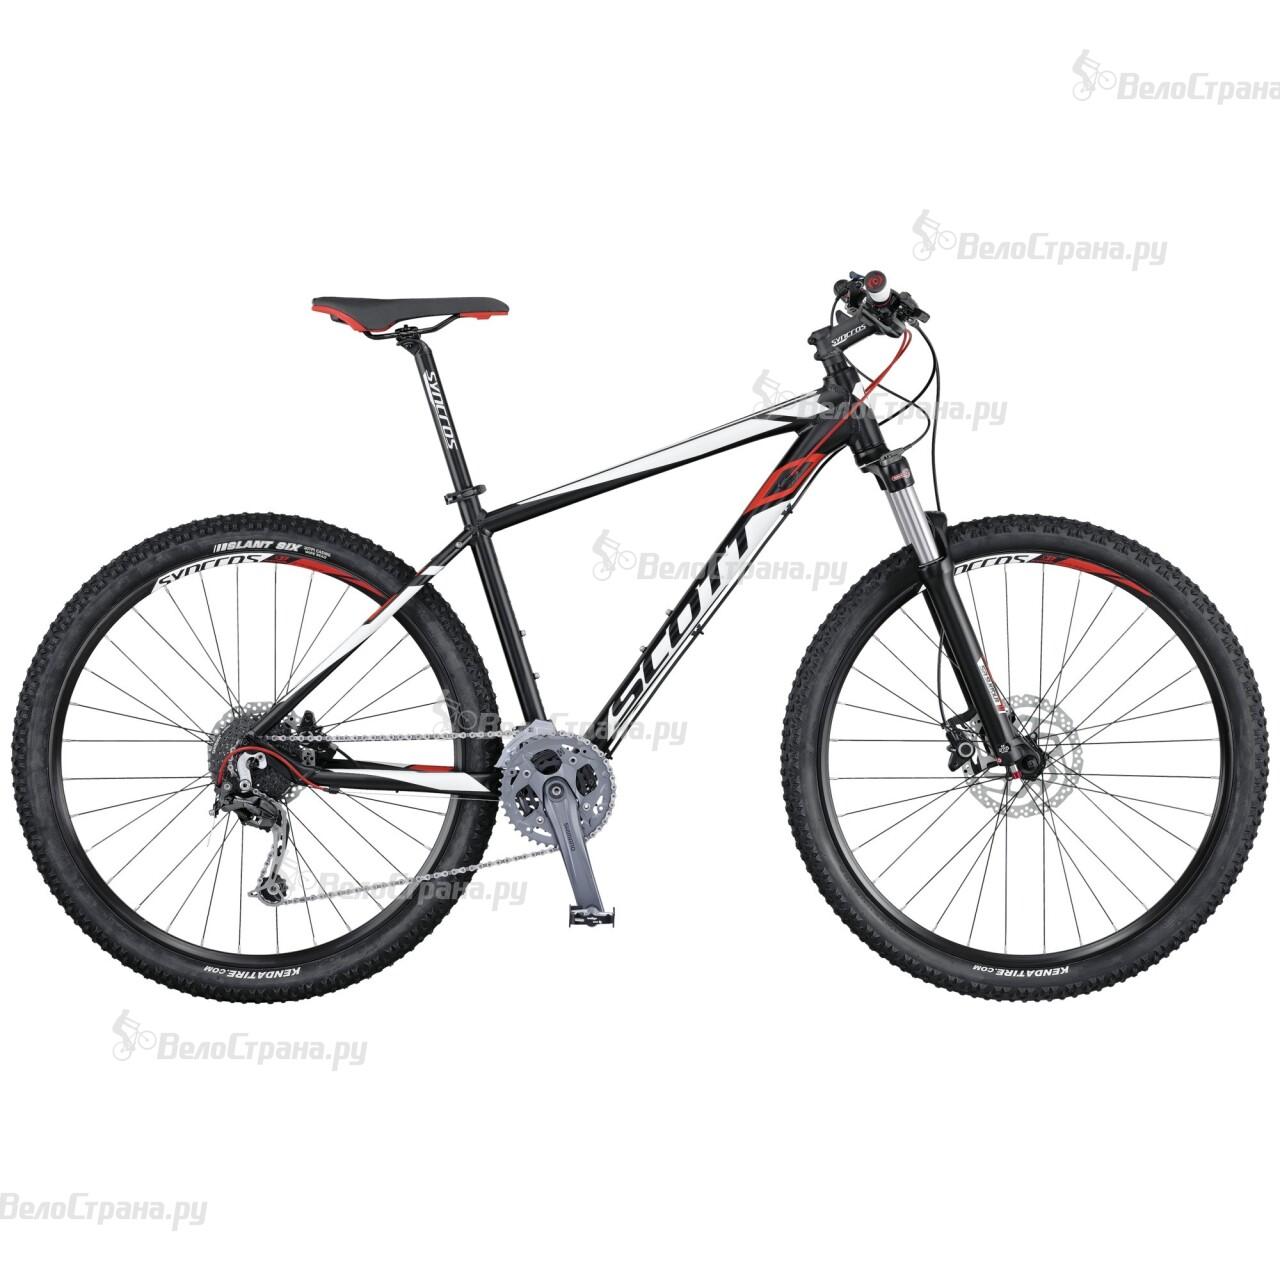 Велосипед Scott Aspect 930 (2016) велосипед scott aspect 930 29 2016